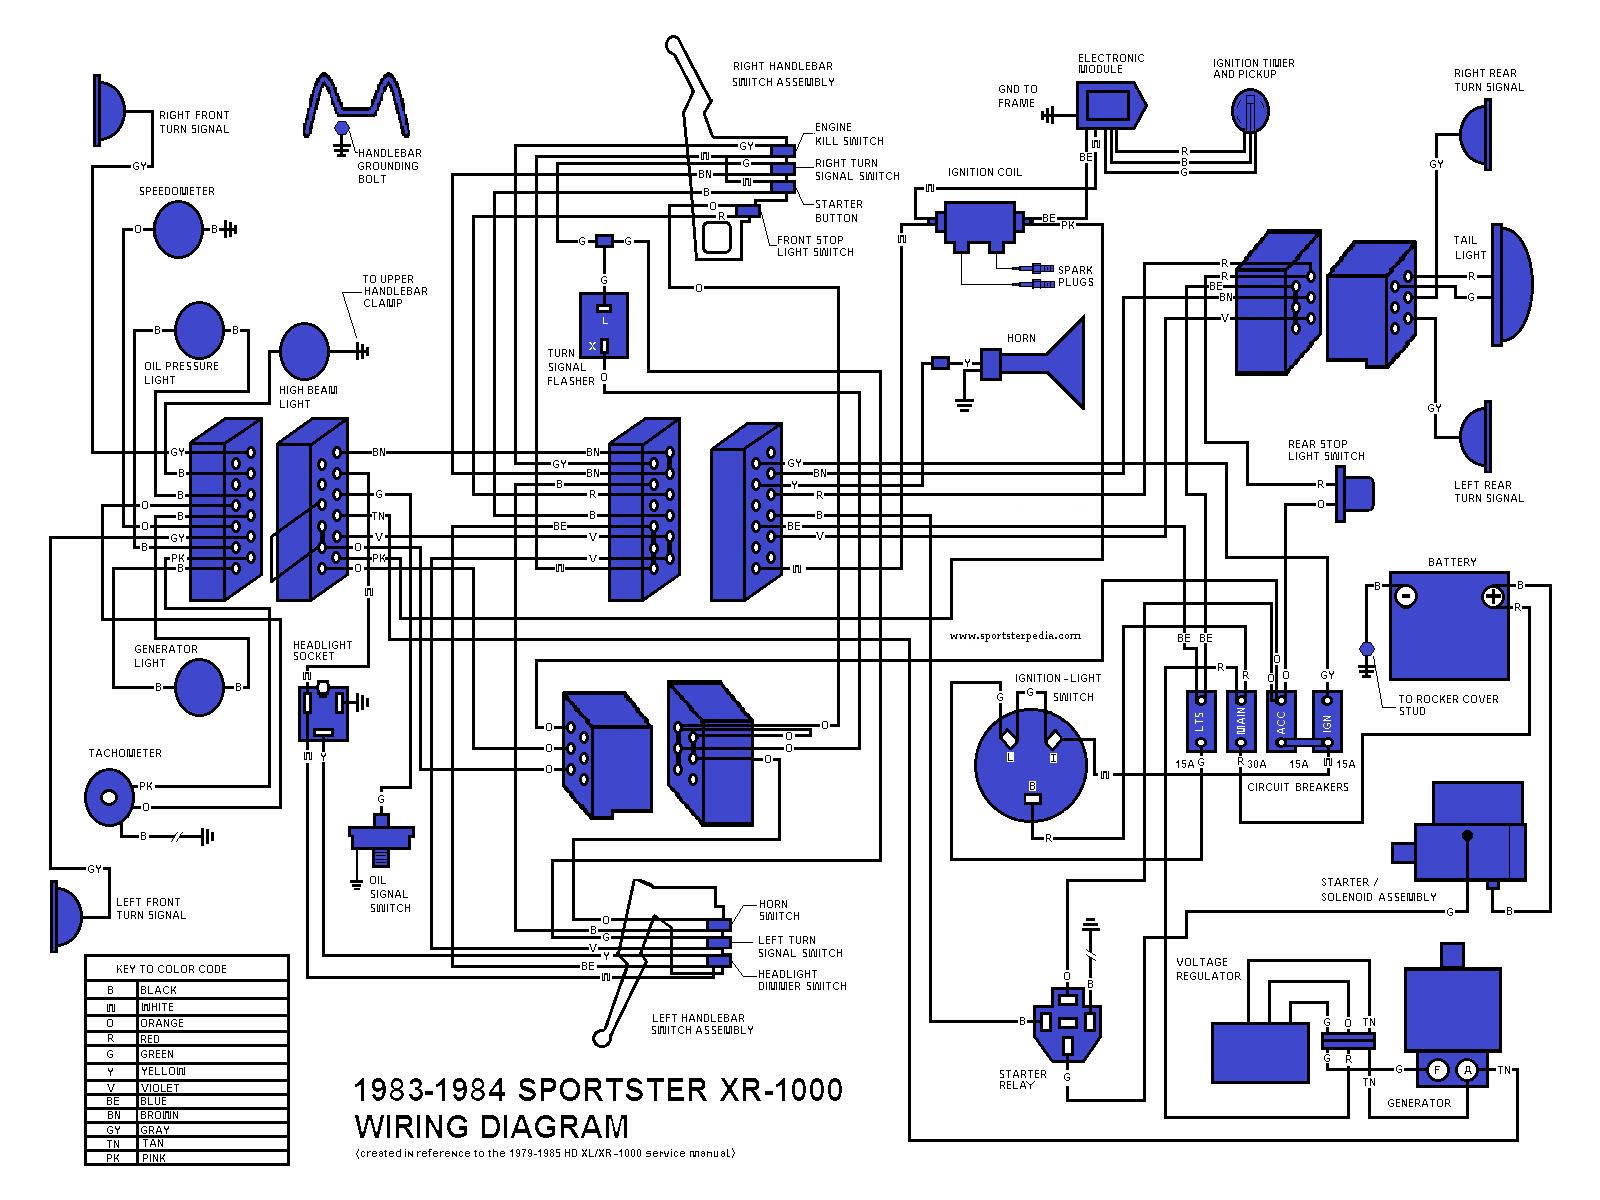 1982 Harley Davidson Sportster Wiring Diagram Wiring Diagram Corsa B Corsa B Pasticceriagele It